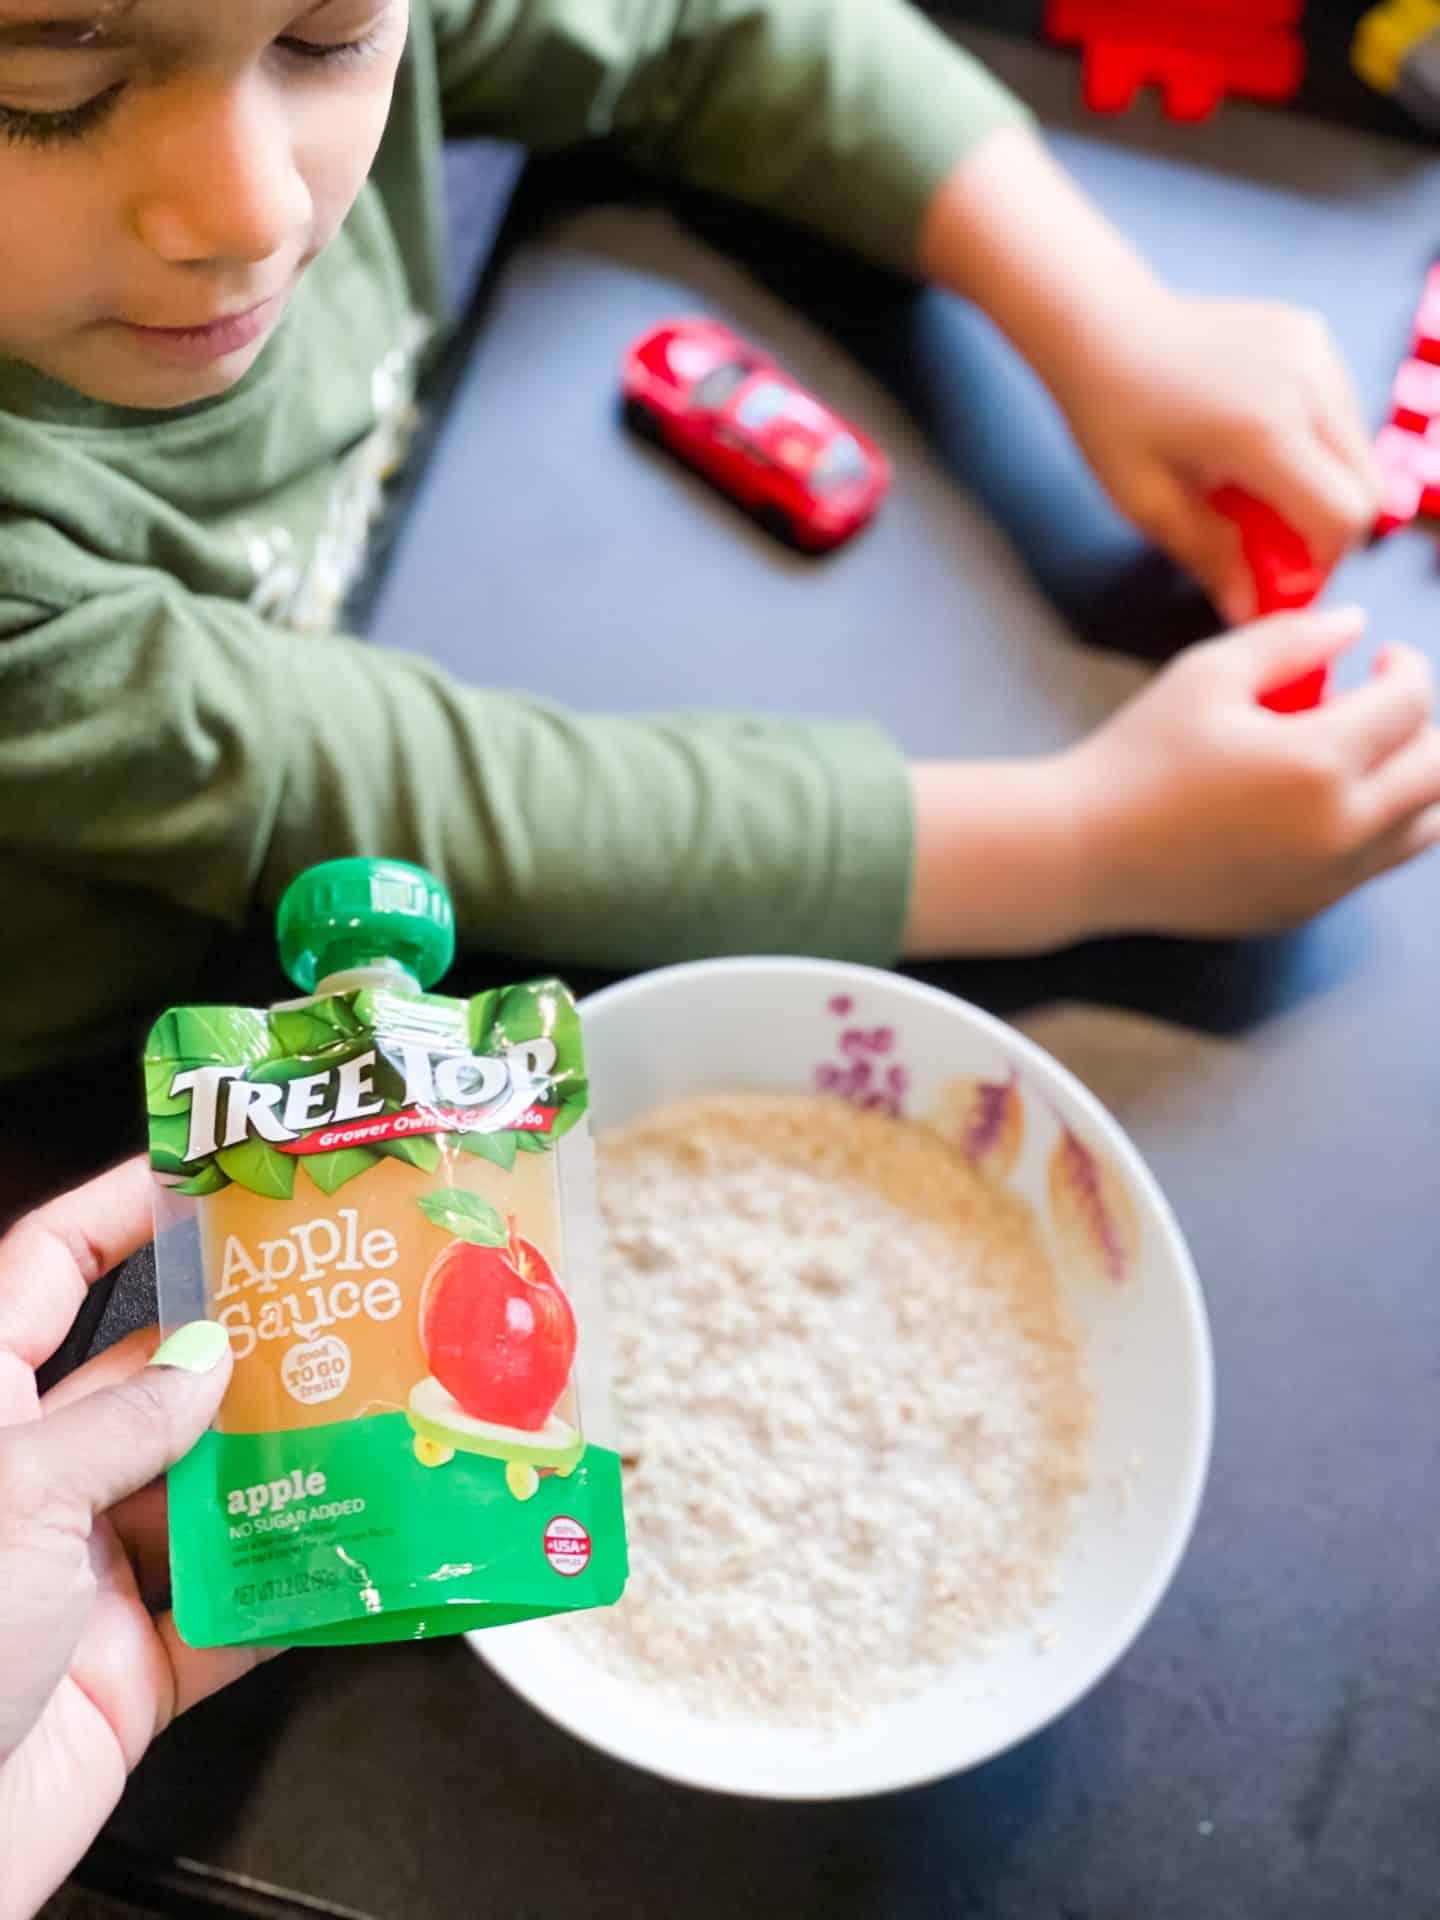 Snack-Time-Ideas-Tree-Top-Fruit-Snacks-Beverage